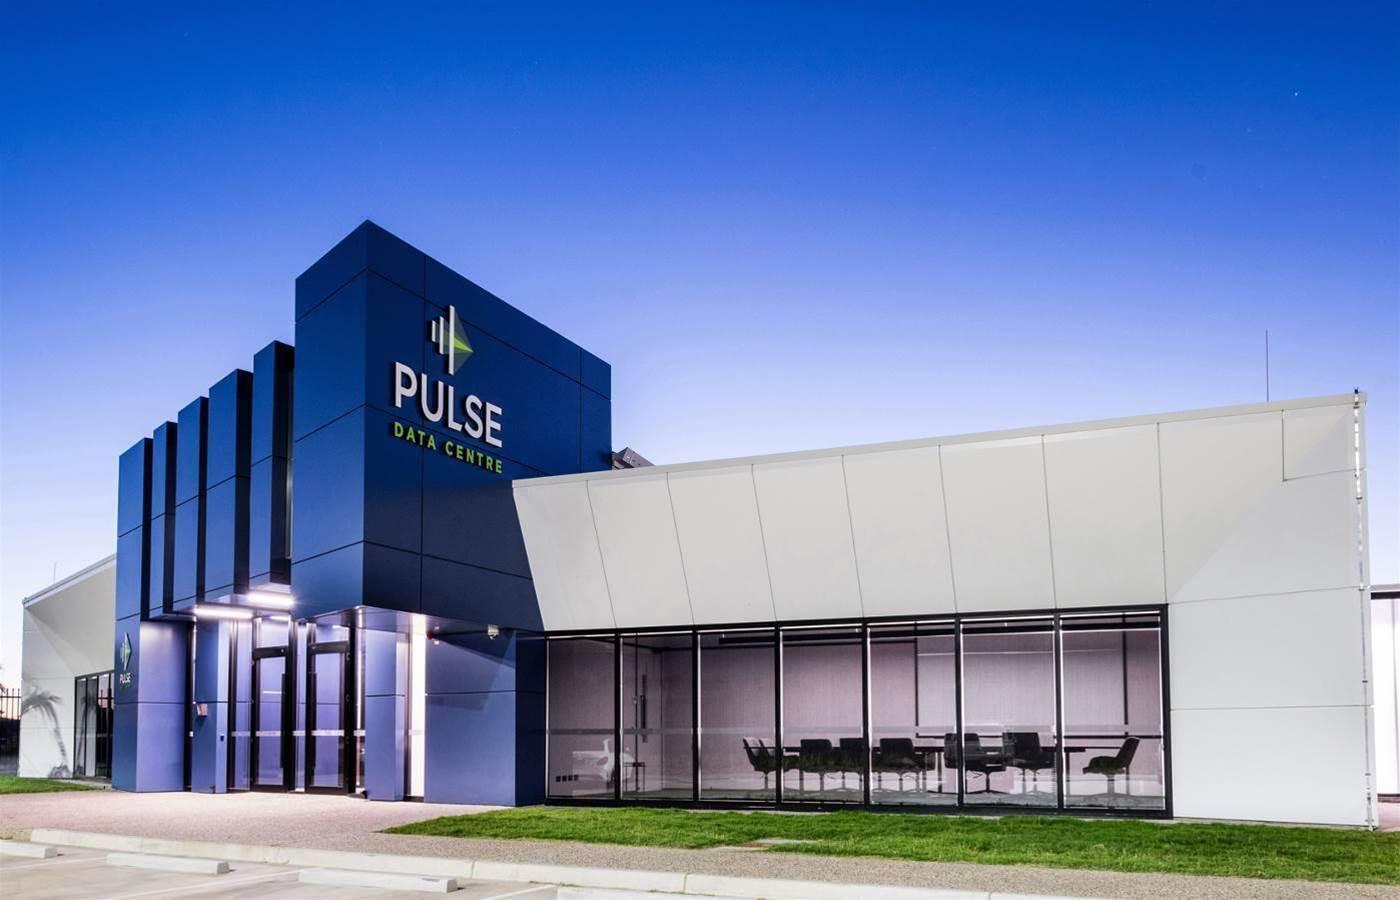 Pulse DC joins QLD govt IT panel